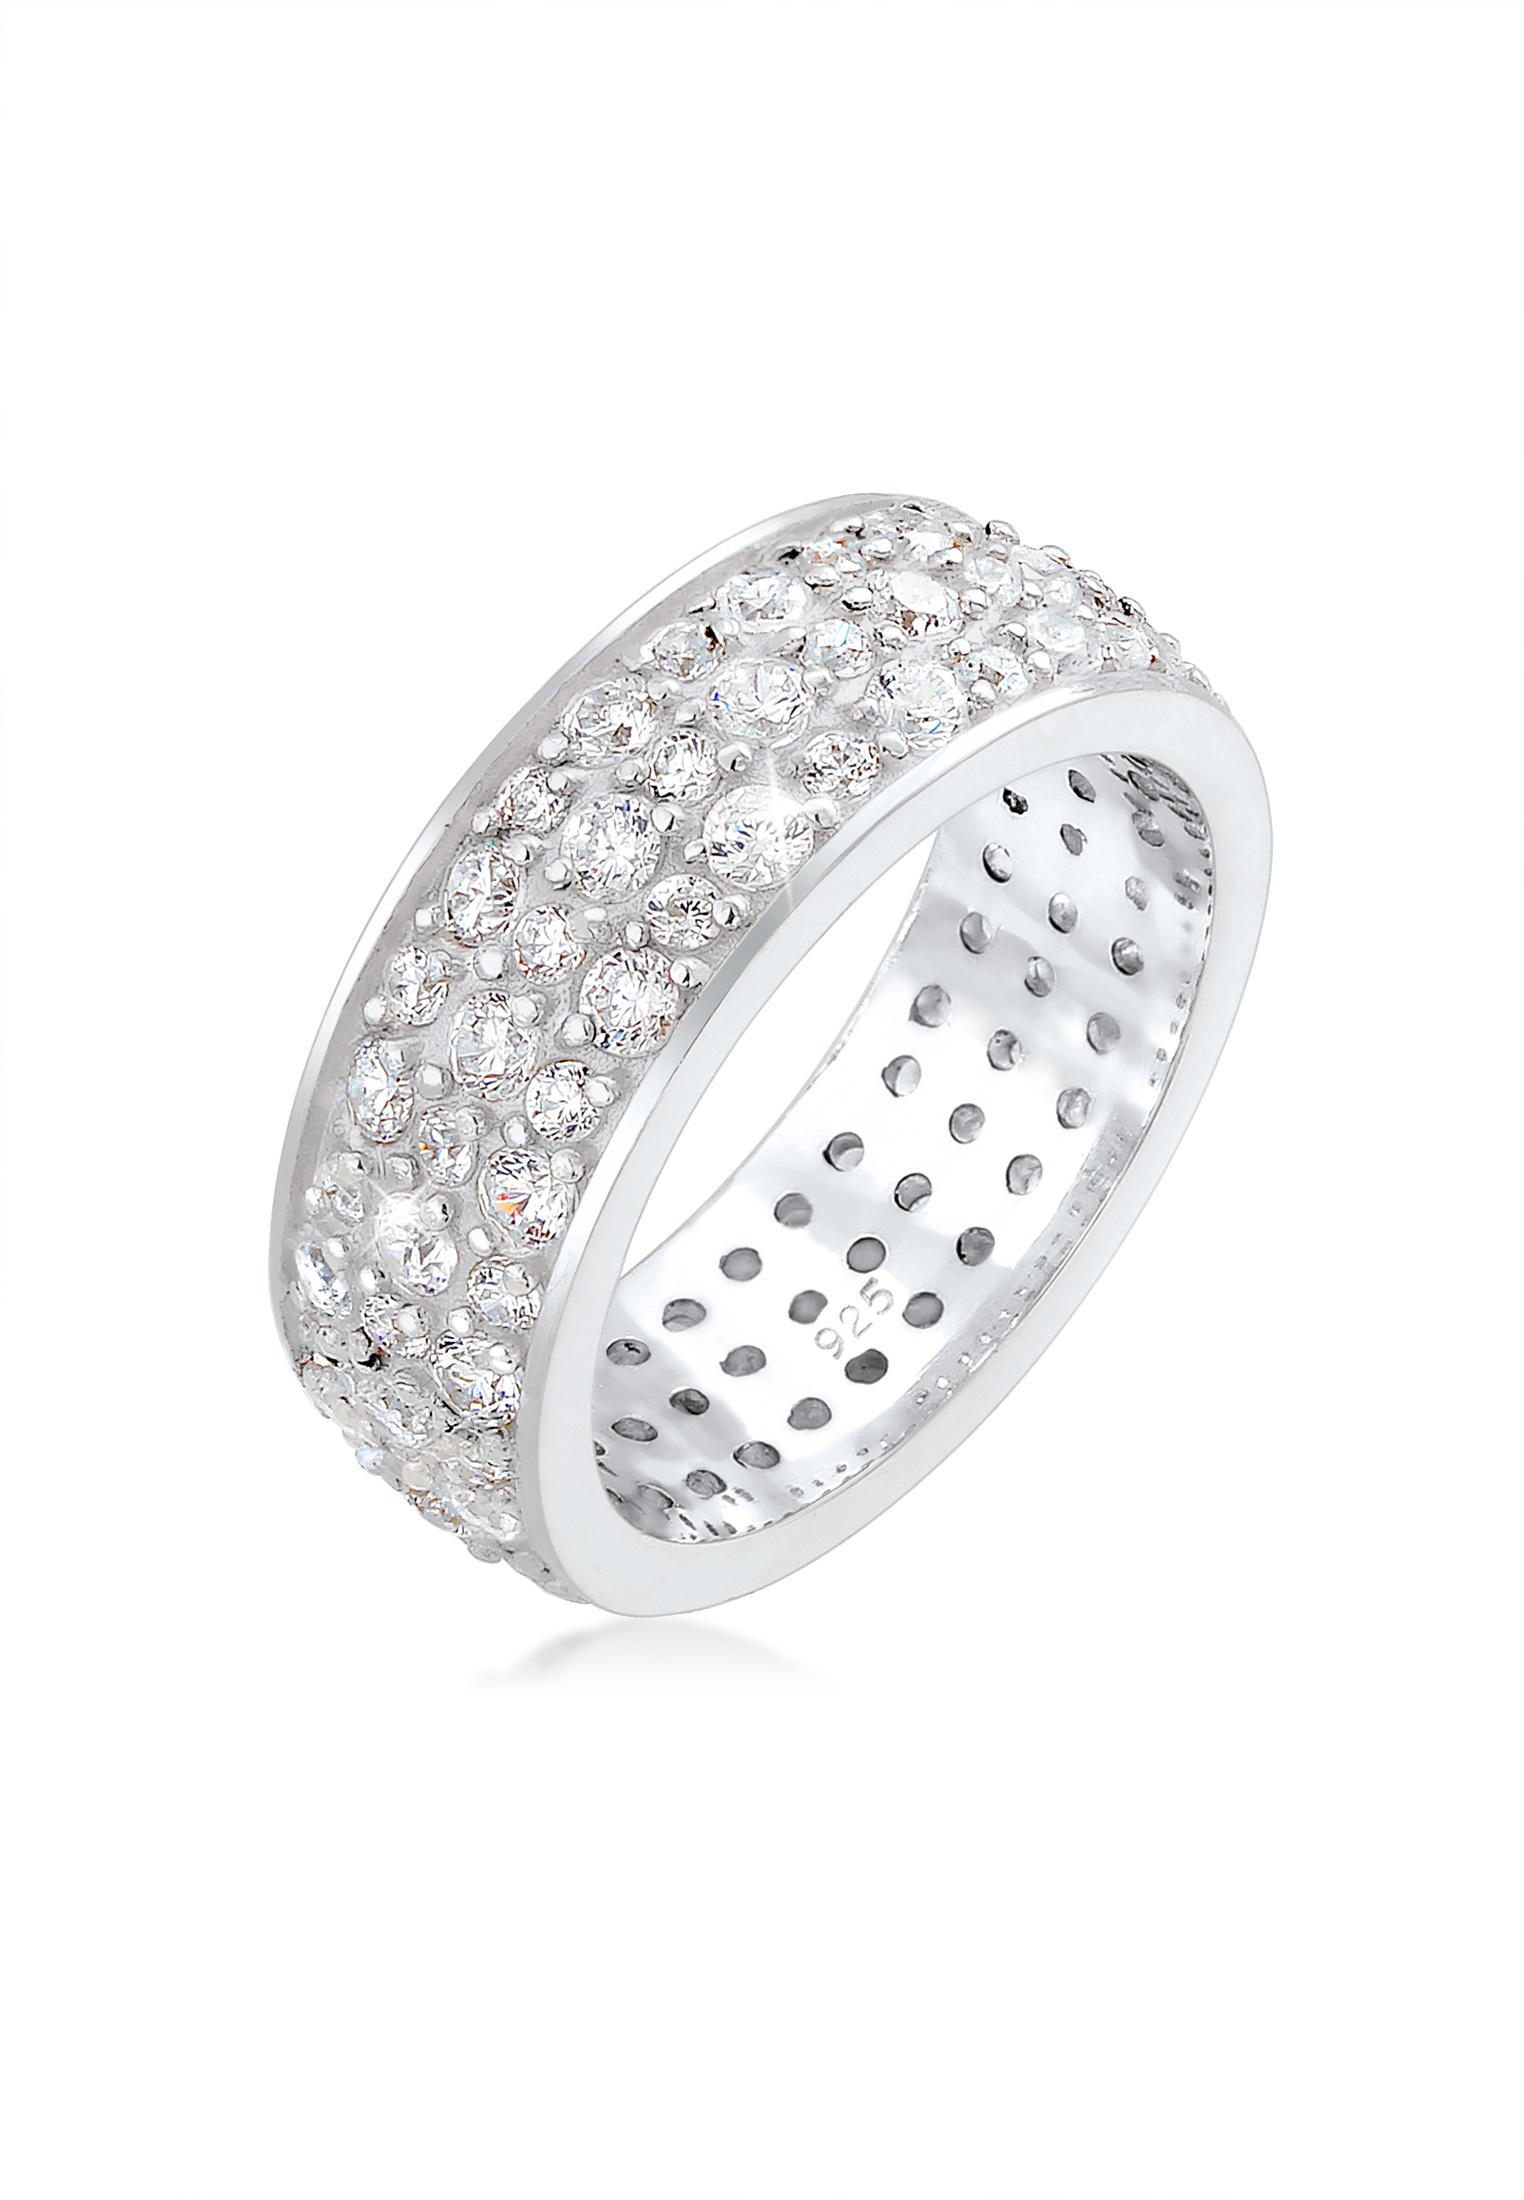 Bandring | Zirkonia ( Weiß ) | 925er Sterling Silber